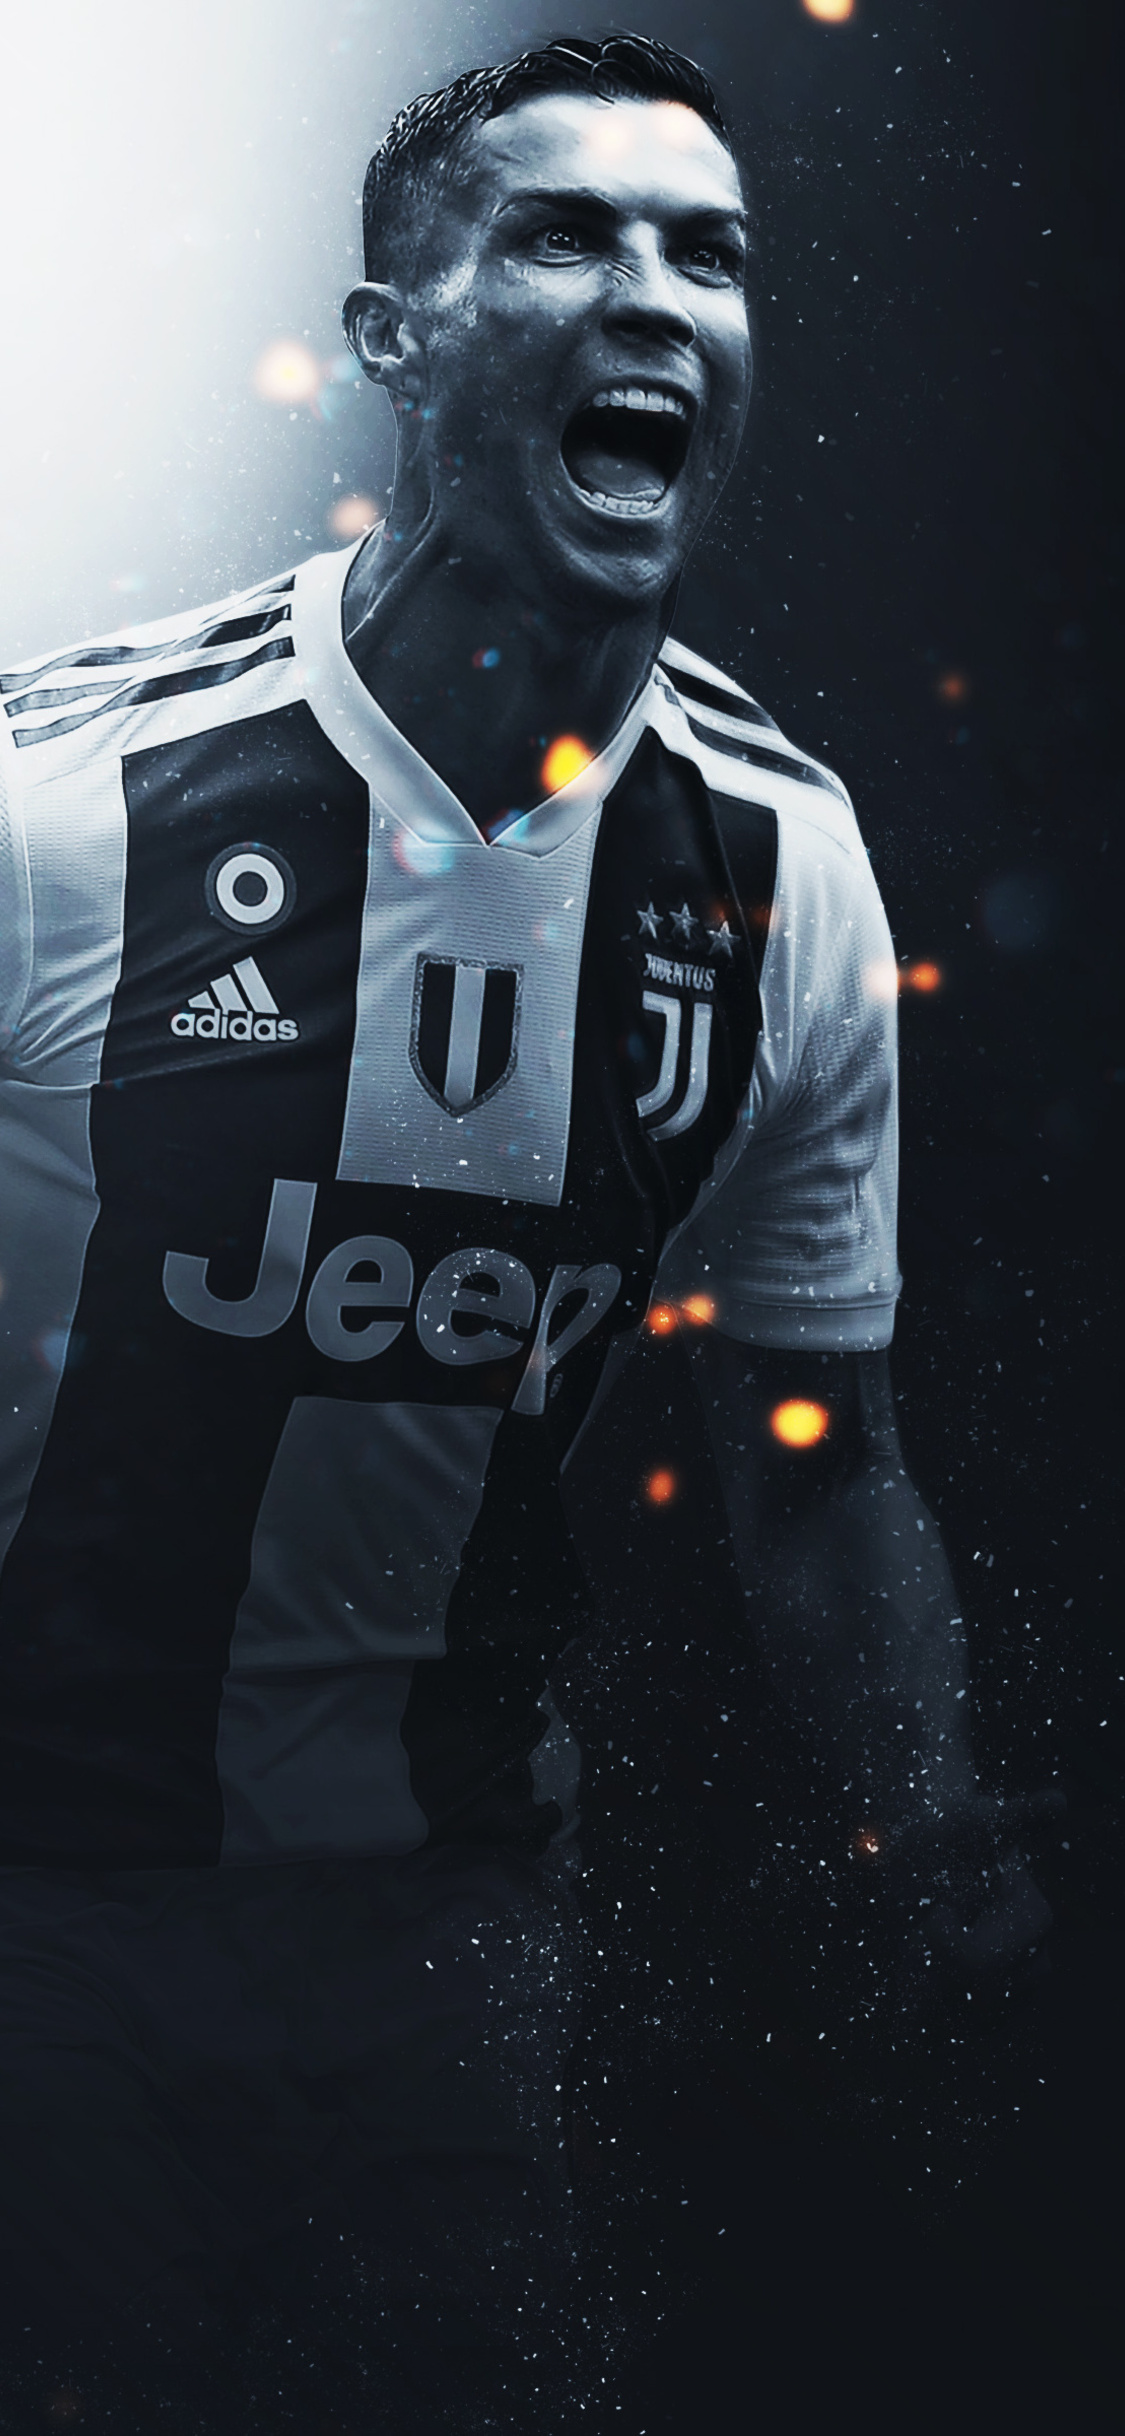 1125x2436 Cristiano Ronaldo Juventus FC Iphone XS,Iphone ...